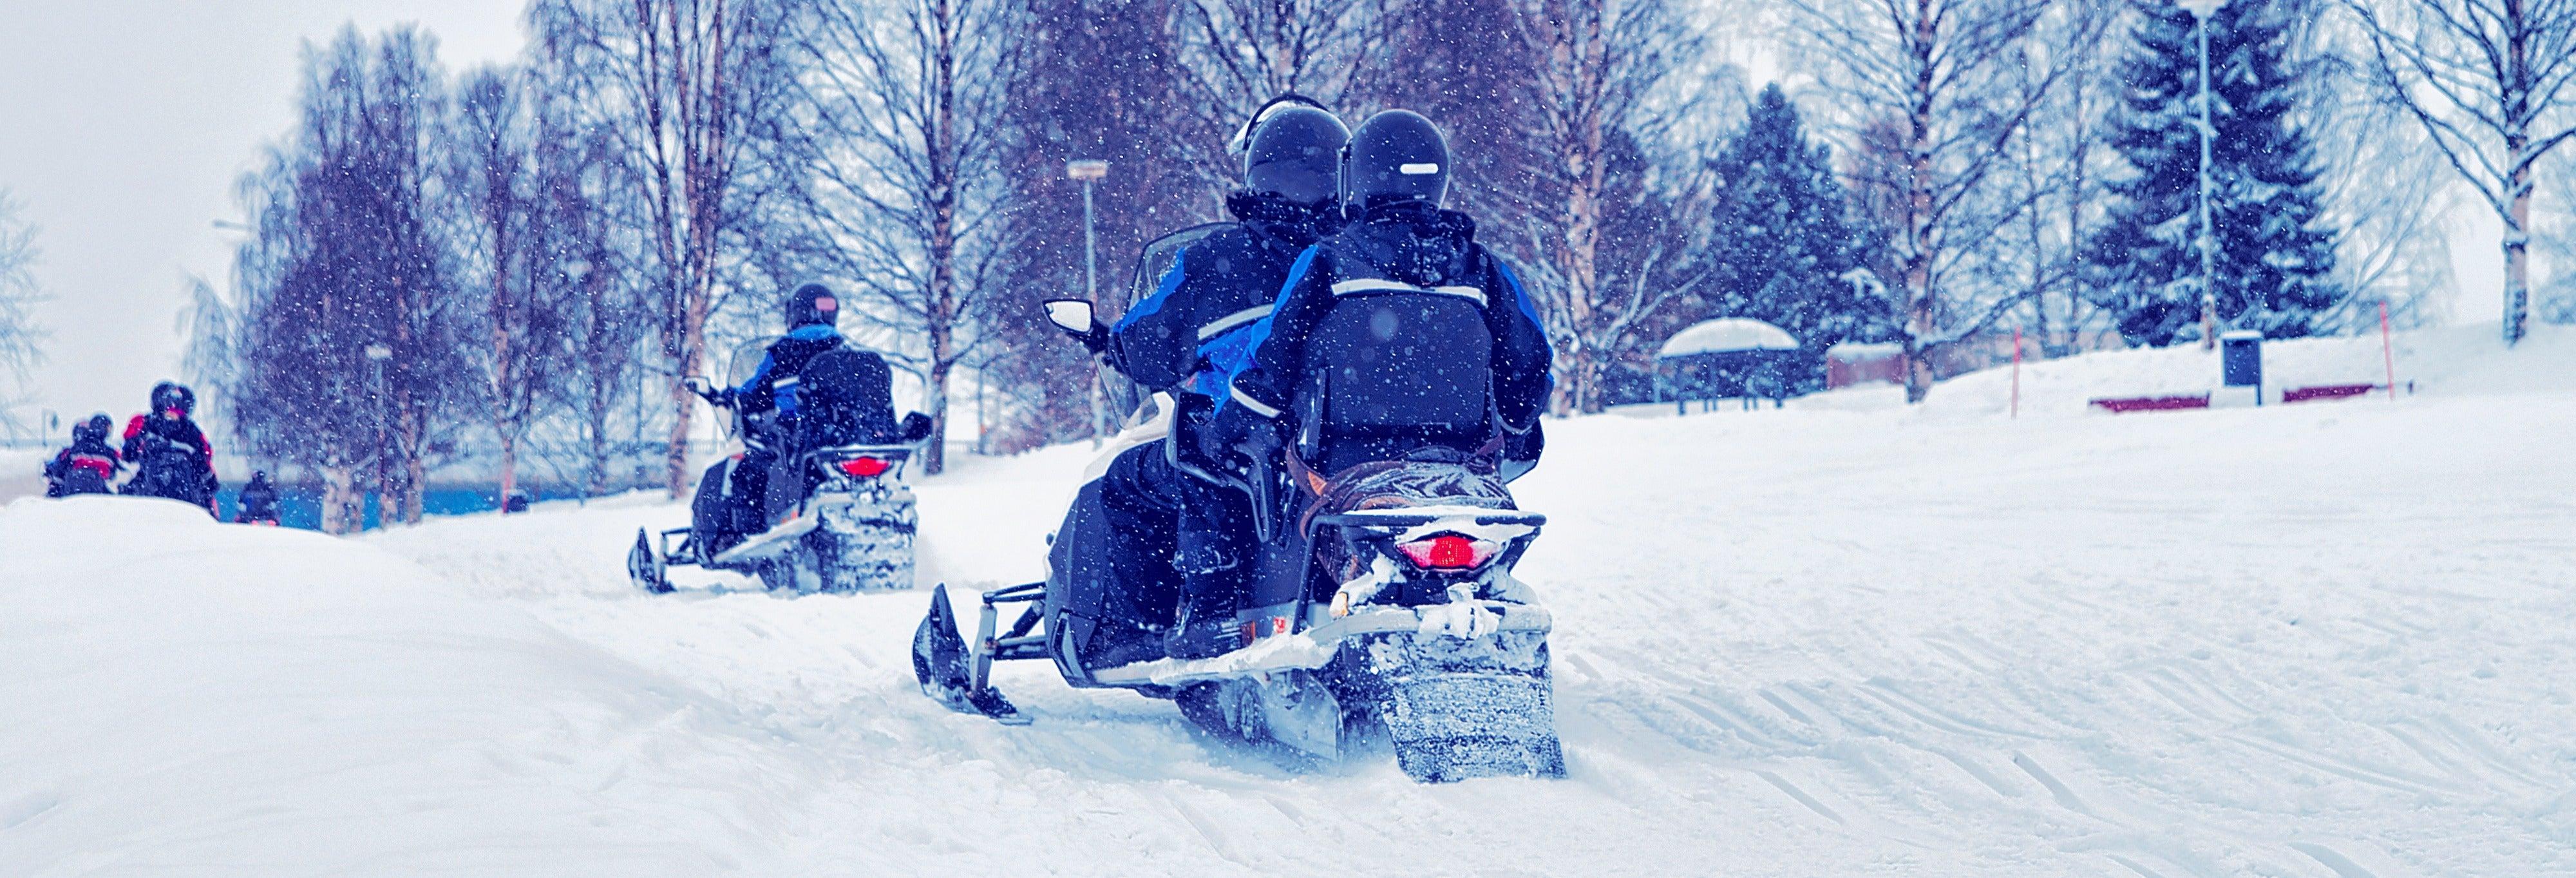 Snowmobile Ride & Ice Fishing